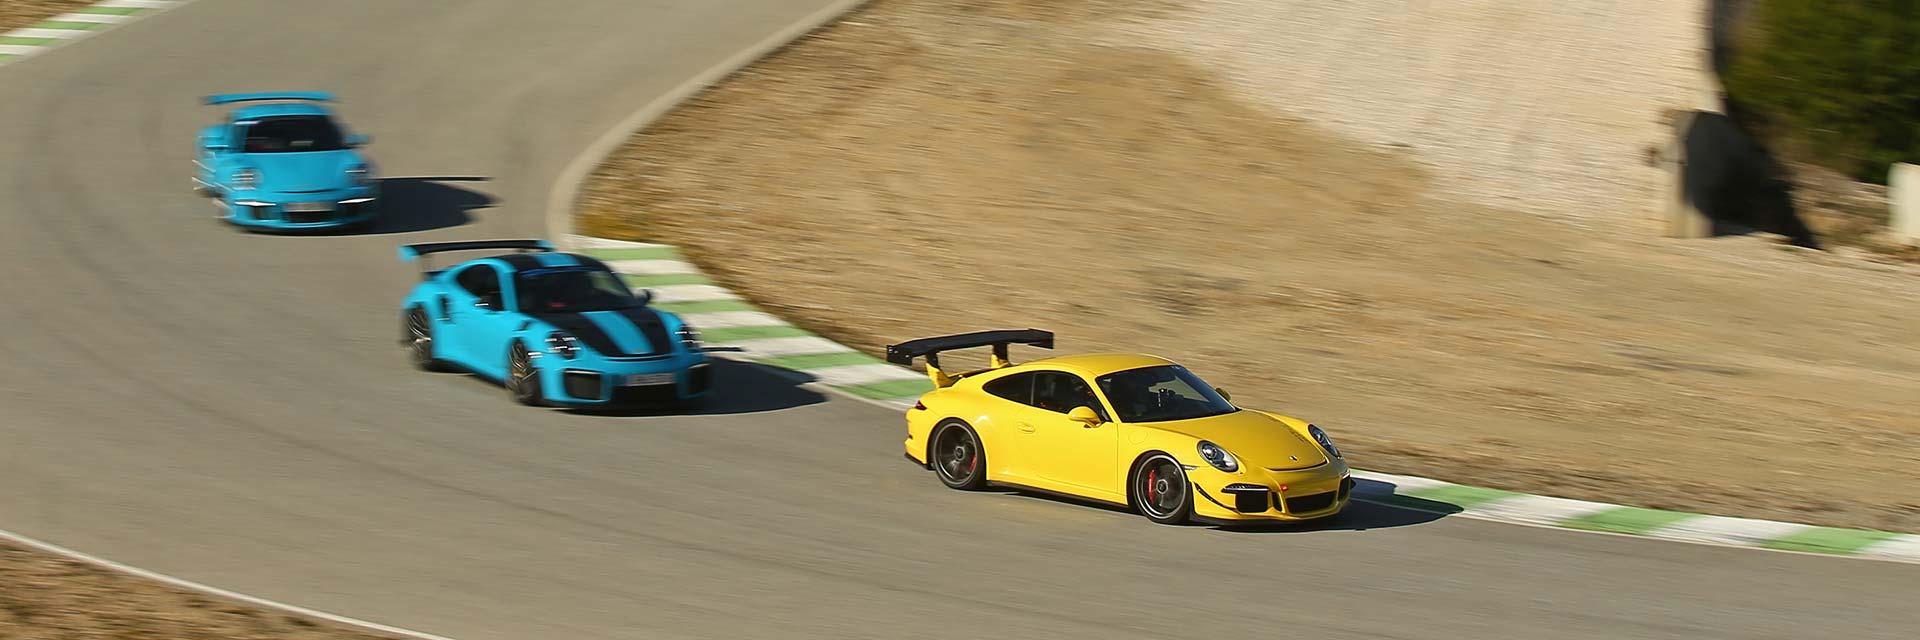 GEDLICH Racing - Racetrack Parcmotor Barcelona Castelloli